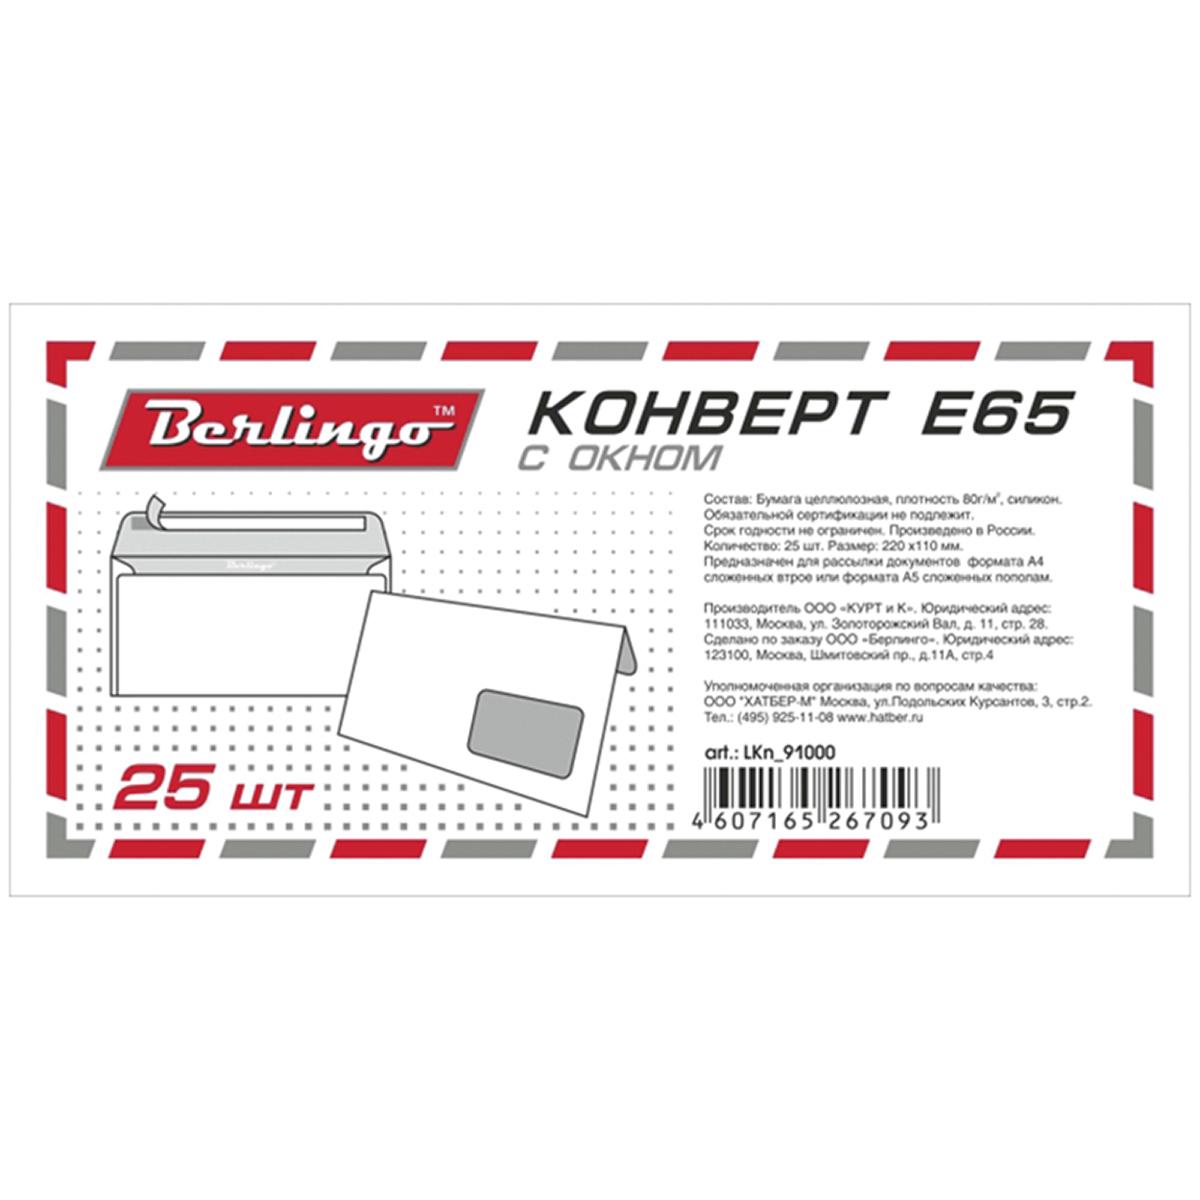 Конверт E65 25 шт LKn_91000, Berlingo